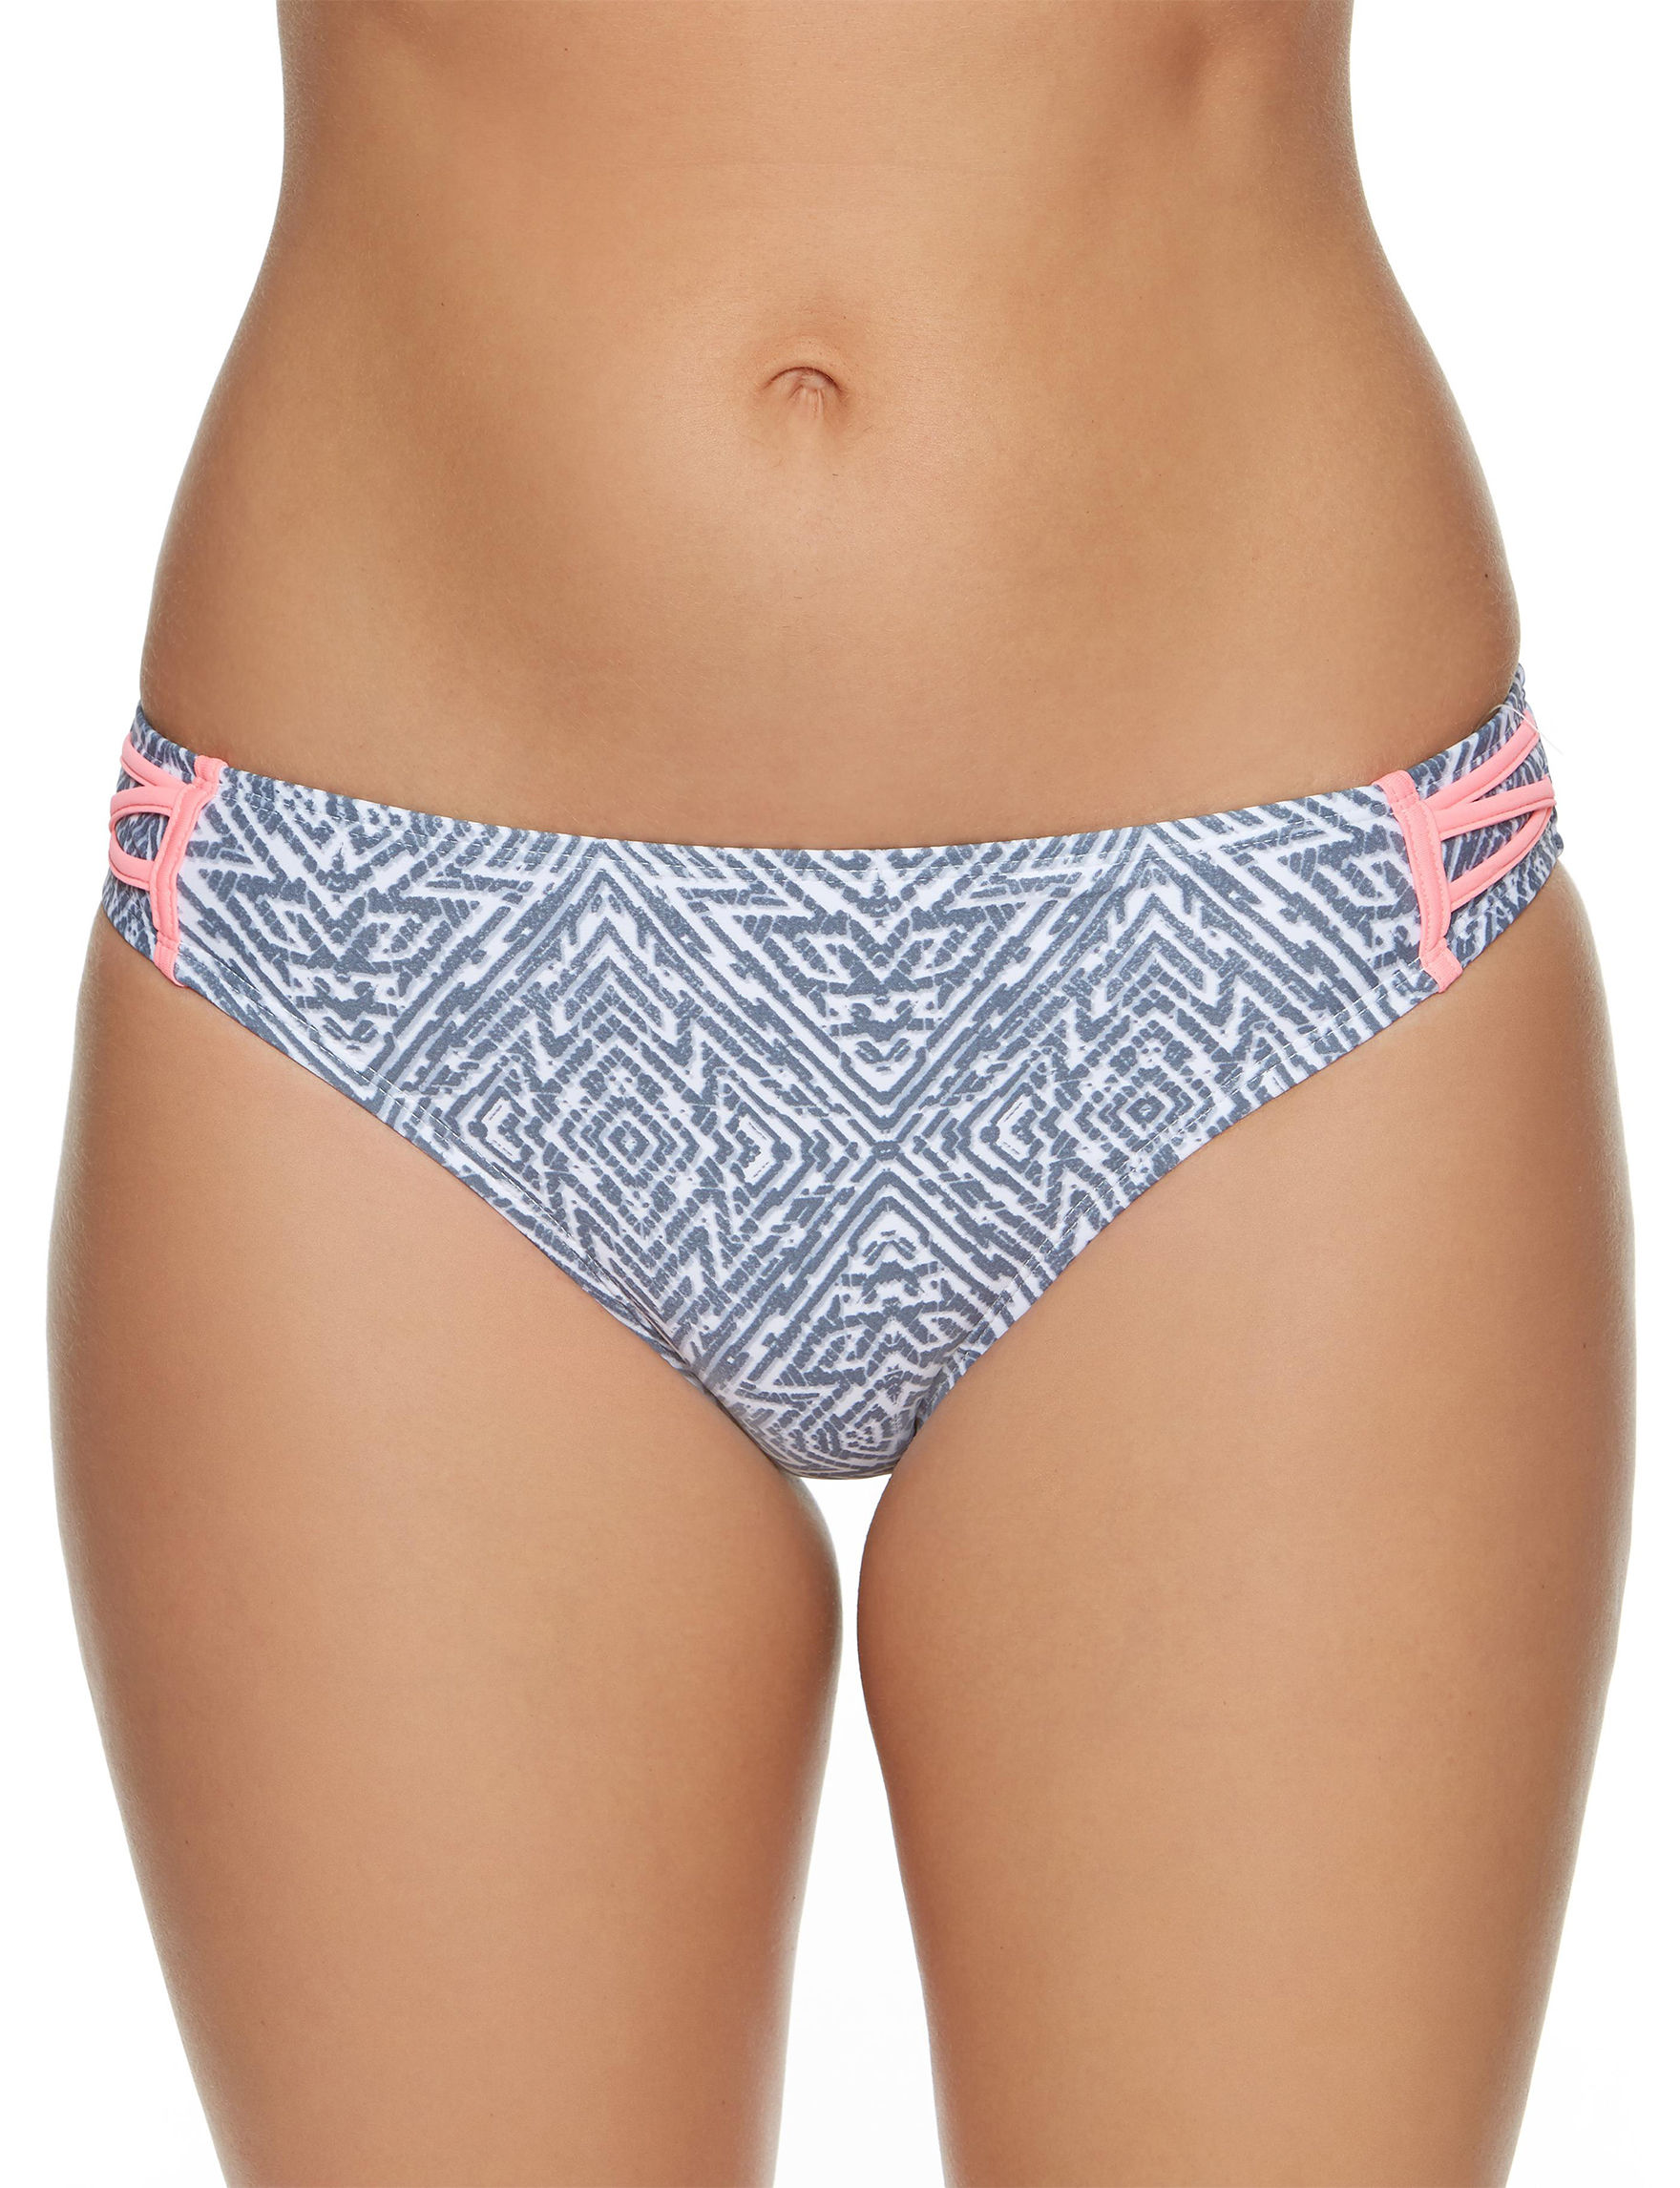 Splashletics Grey Swimsuit Bottoms Hipster